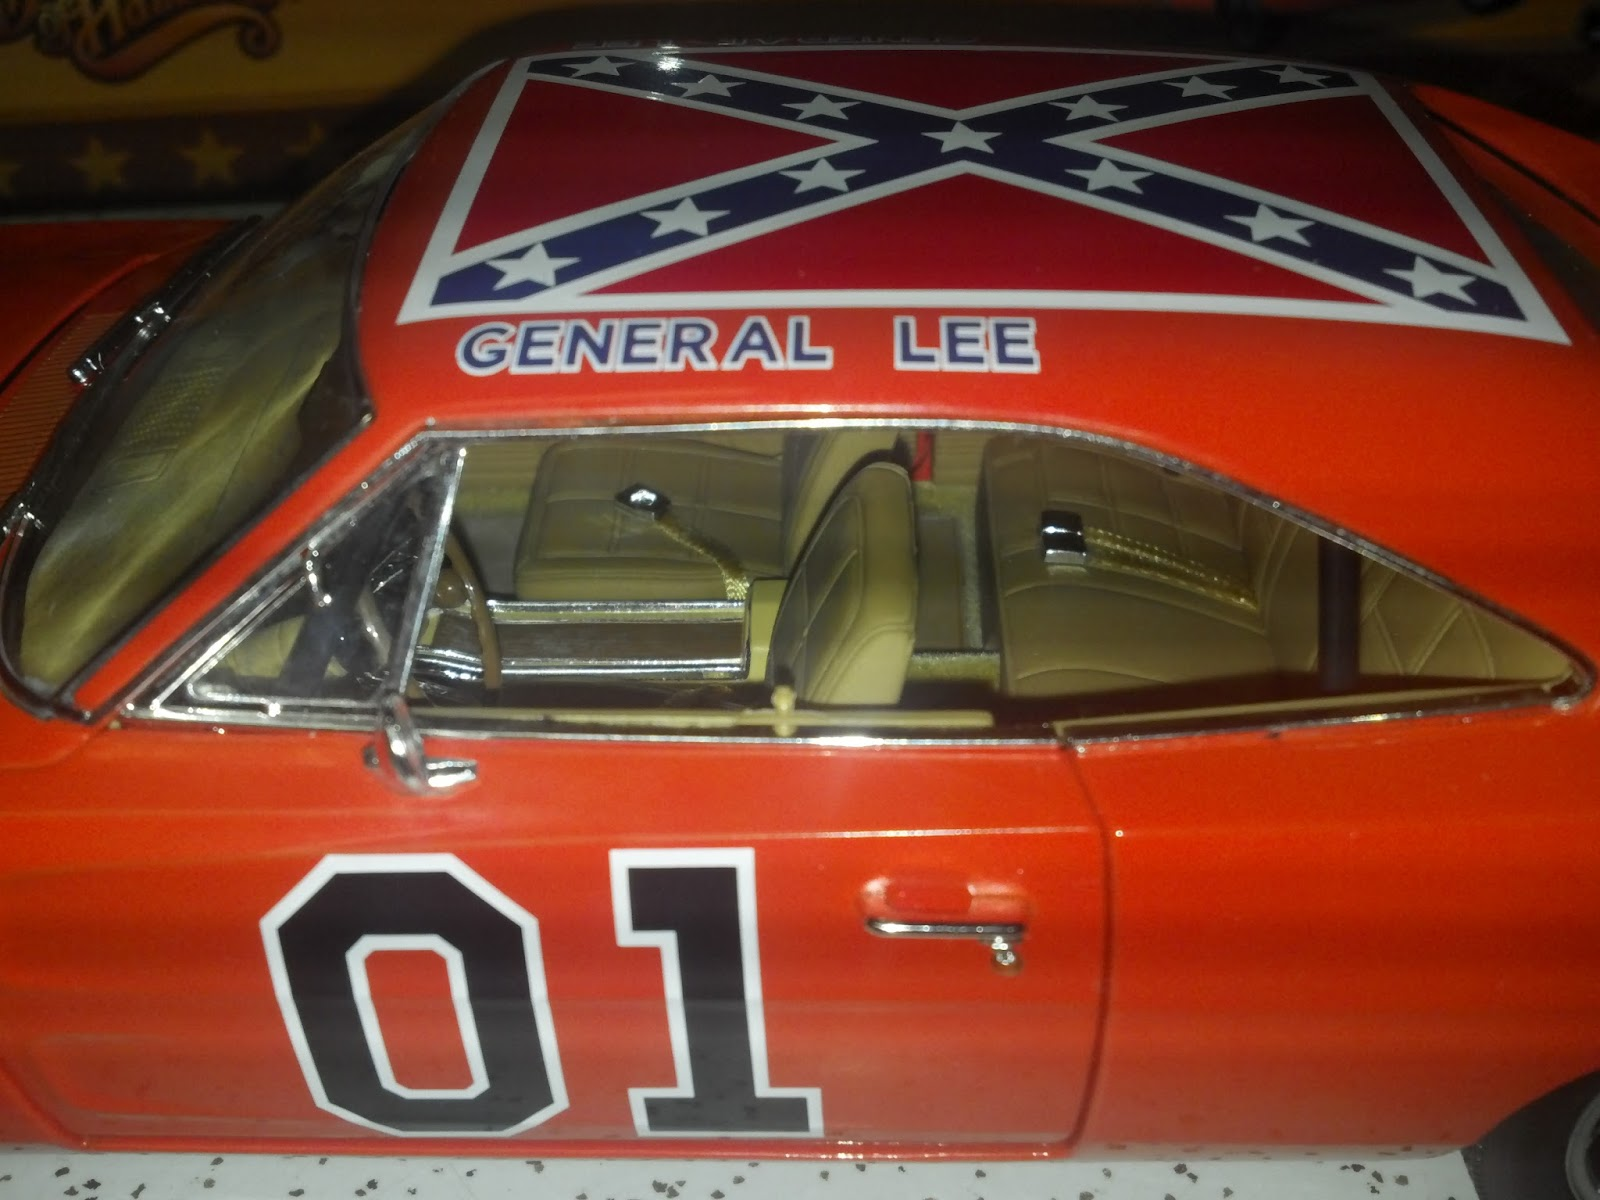 Dukes Of Hazzard Car Roof | www.imgkid.com - The Image Kid ...